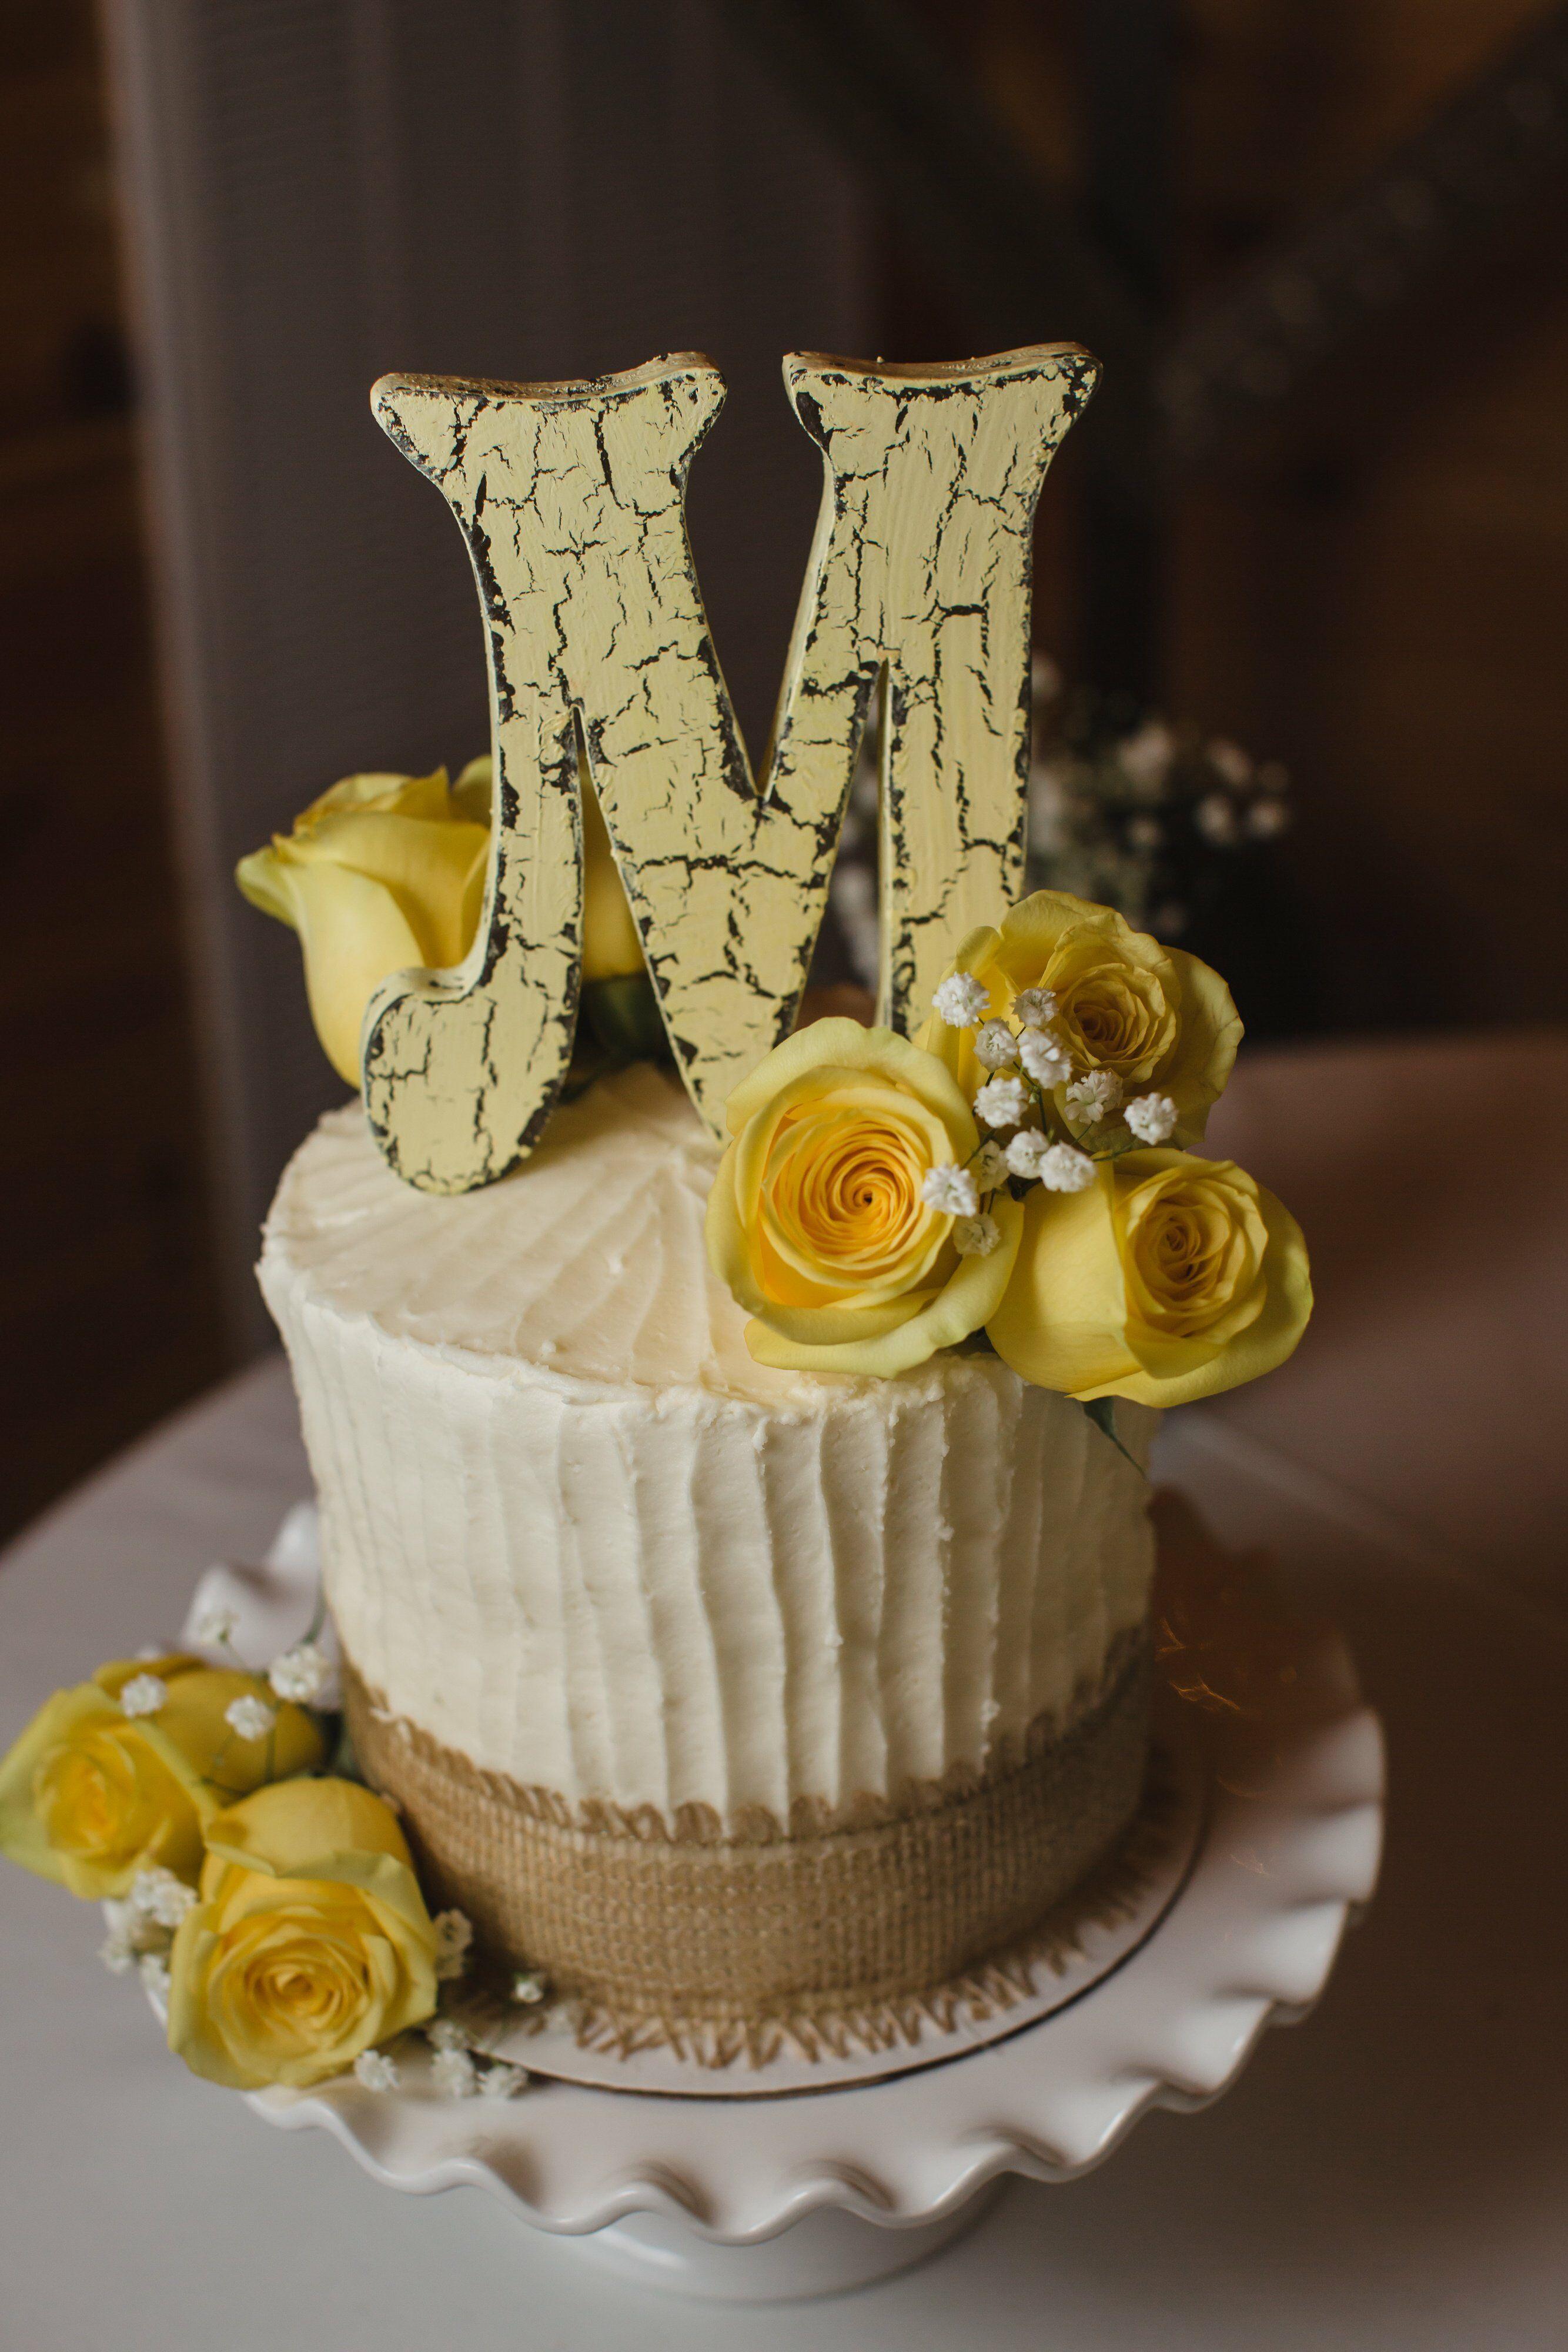 Ivory and Yellow Buttercream Cake